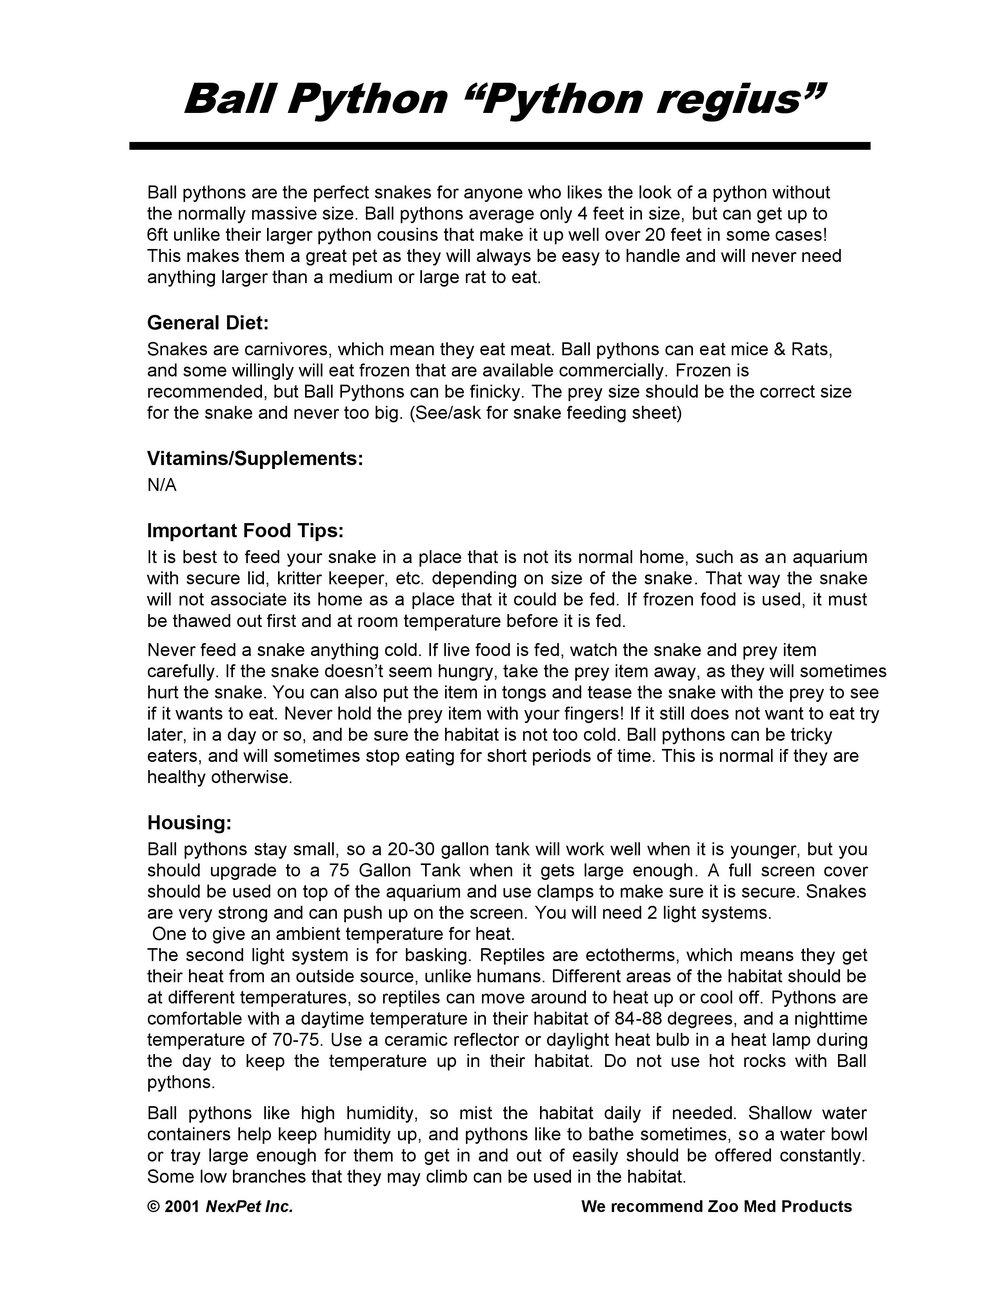 Ball Python Care Sheet Pg1